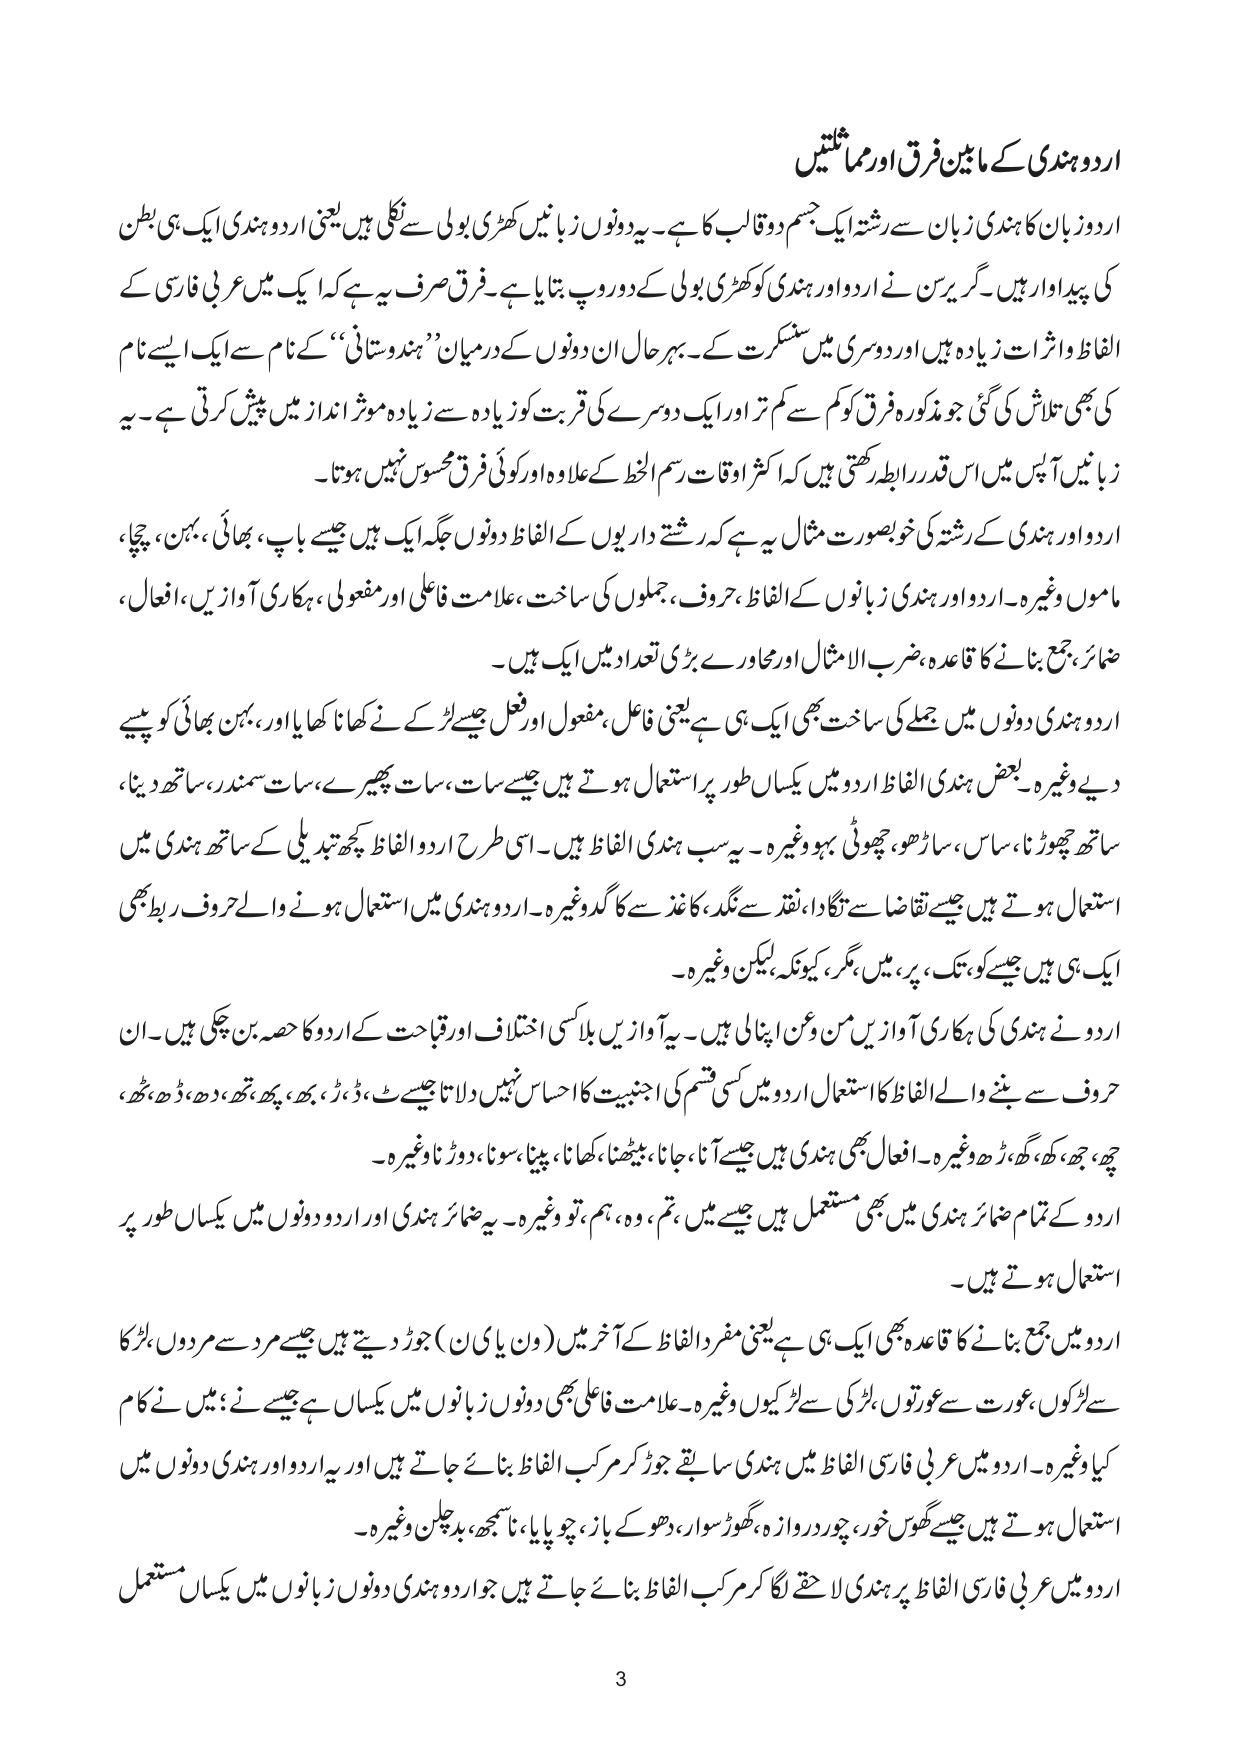 UrduHindi (d)5 Urdu, Urdu news paper, Language